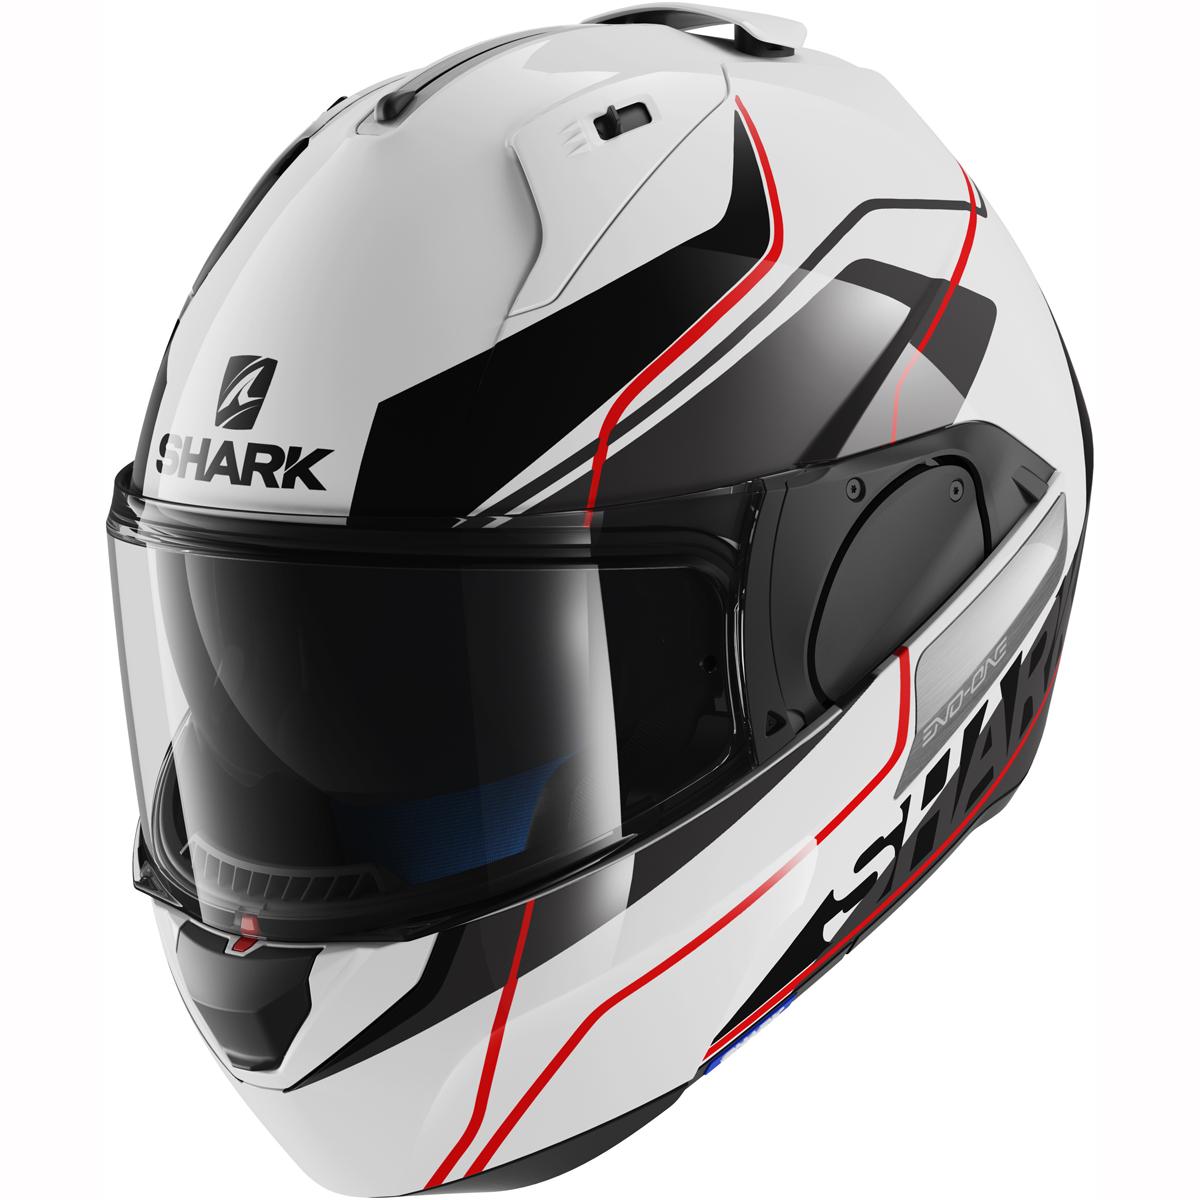 Shark Evo Helmet